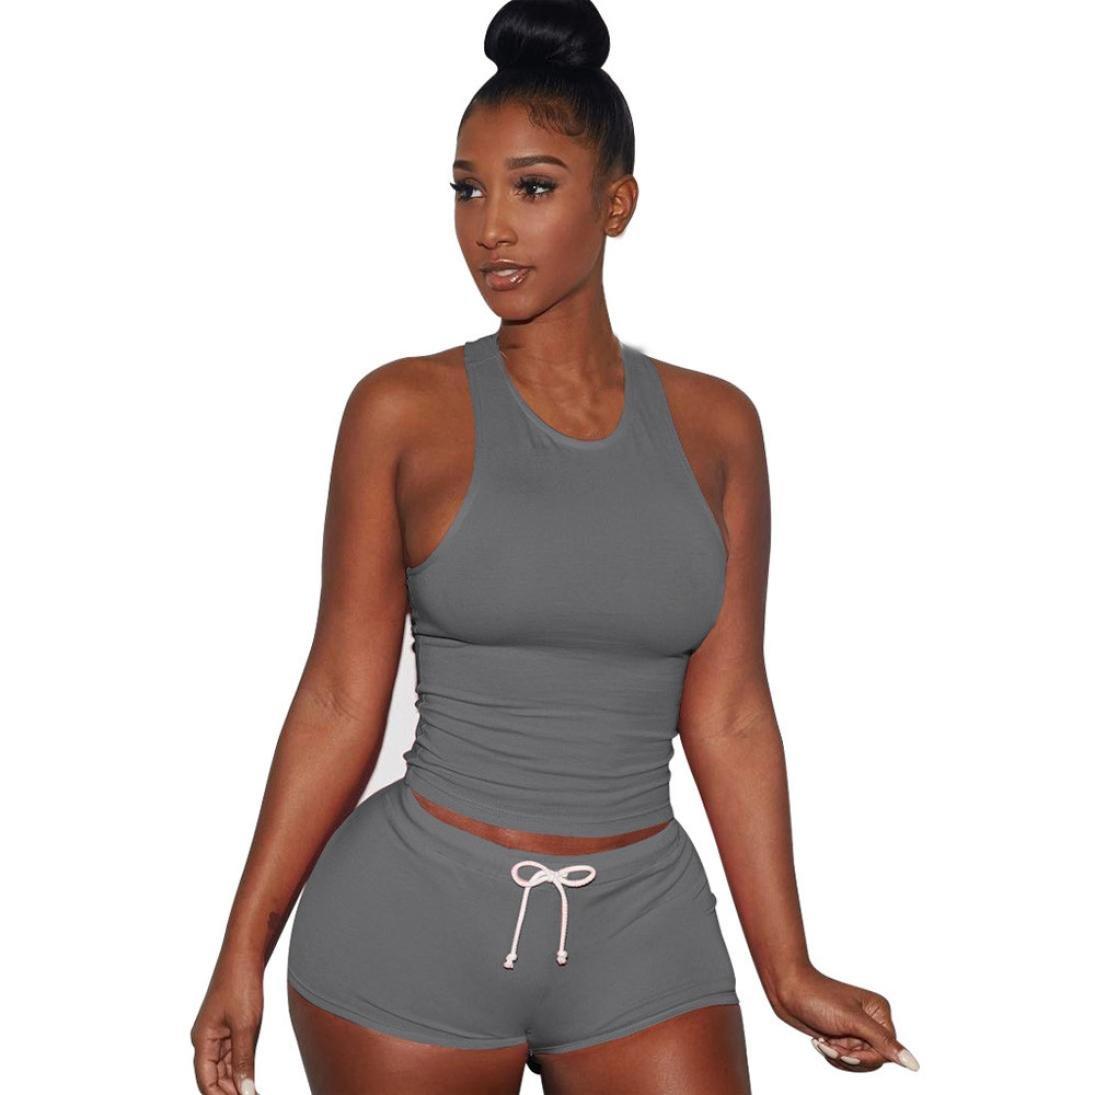 Women Playsuits 2 Piece Set Tank Top + Short Pants Sleeveless Split Casual Outfit Sportswears